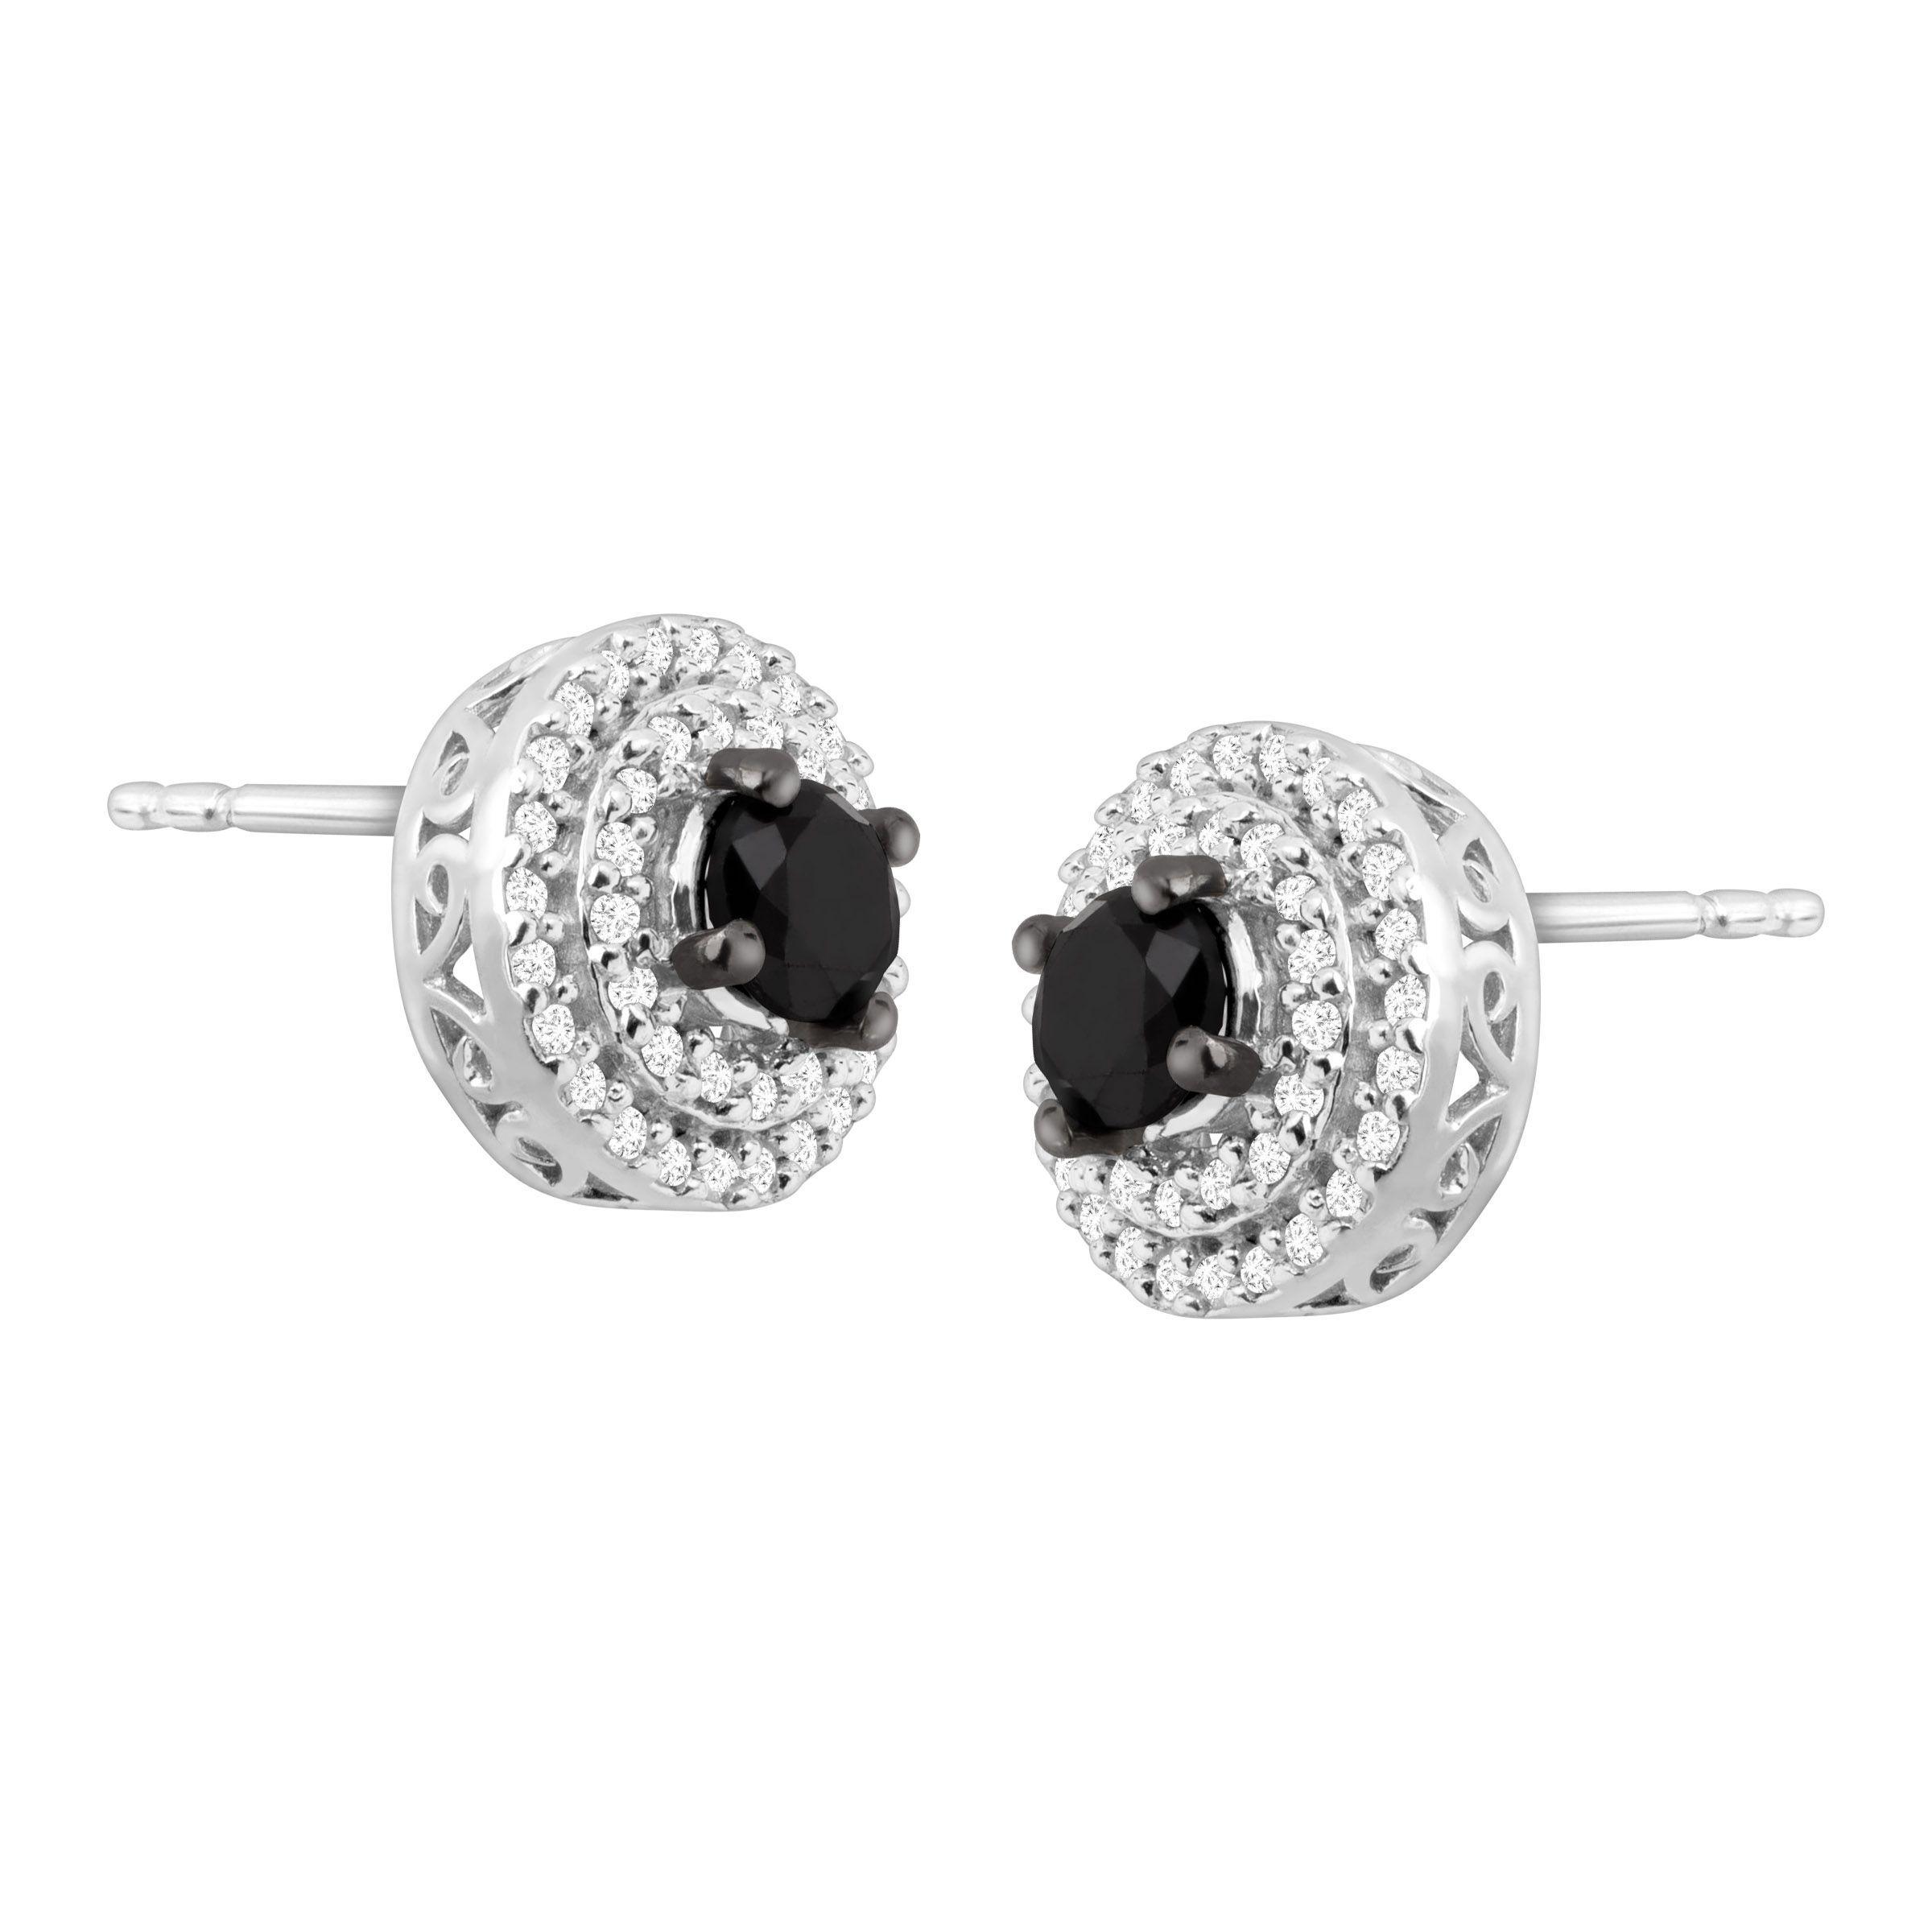 1 Ct Black White Diamond Halo Stud Earrings In Sterling Silver